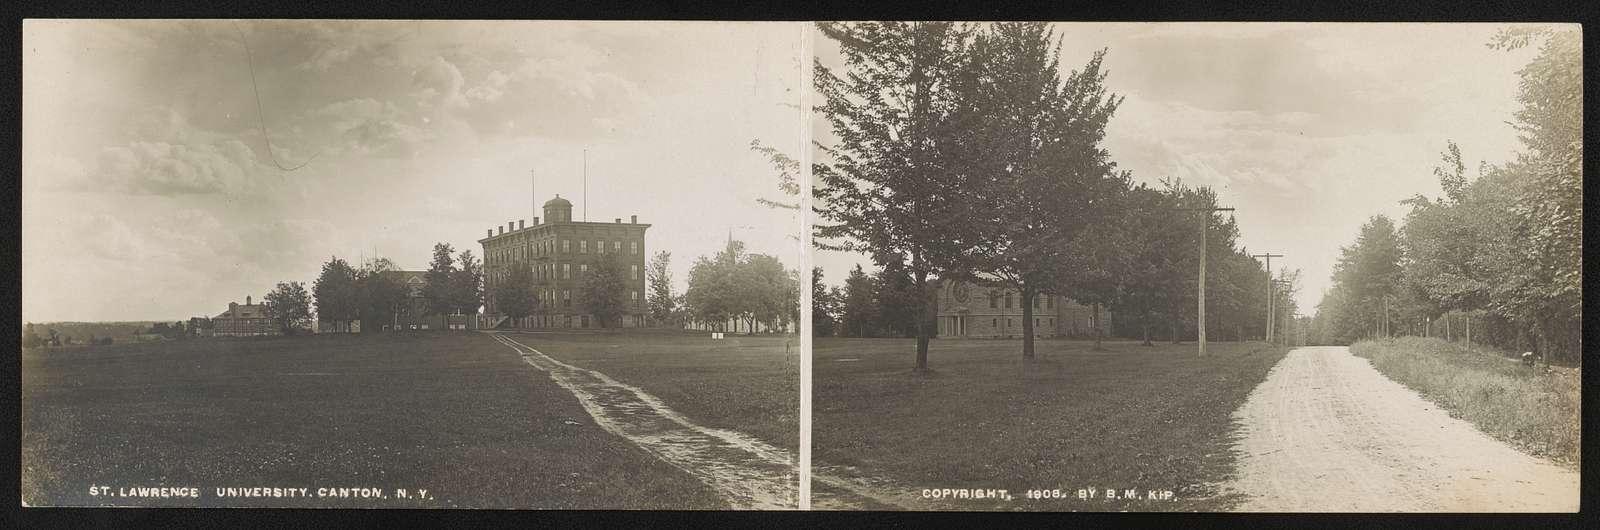 St. Lawrence University, Canton, N.Y.